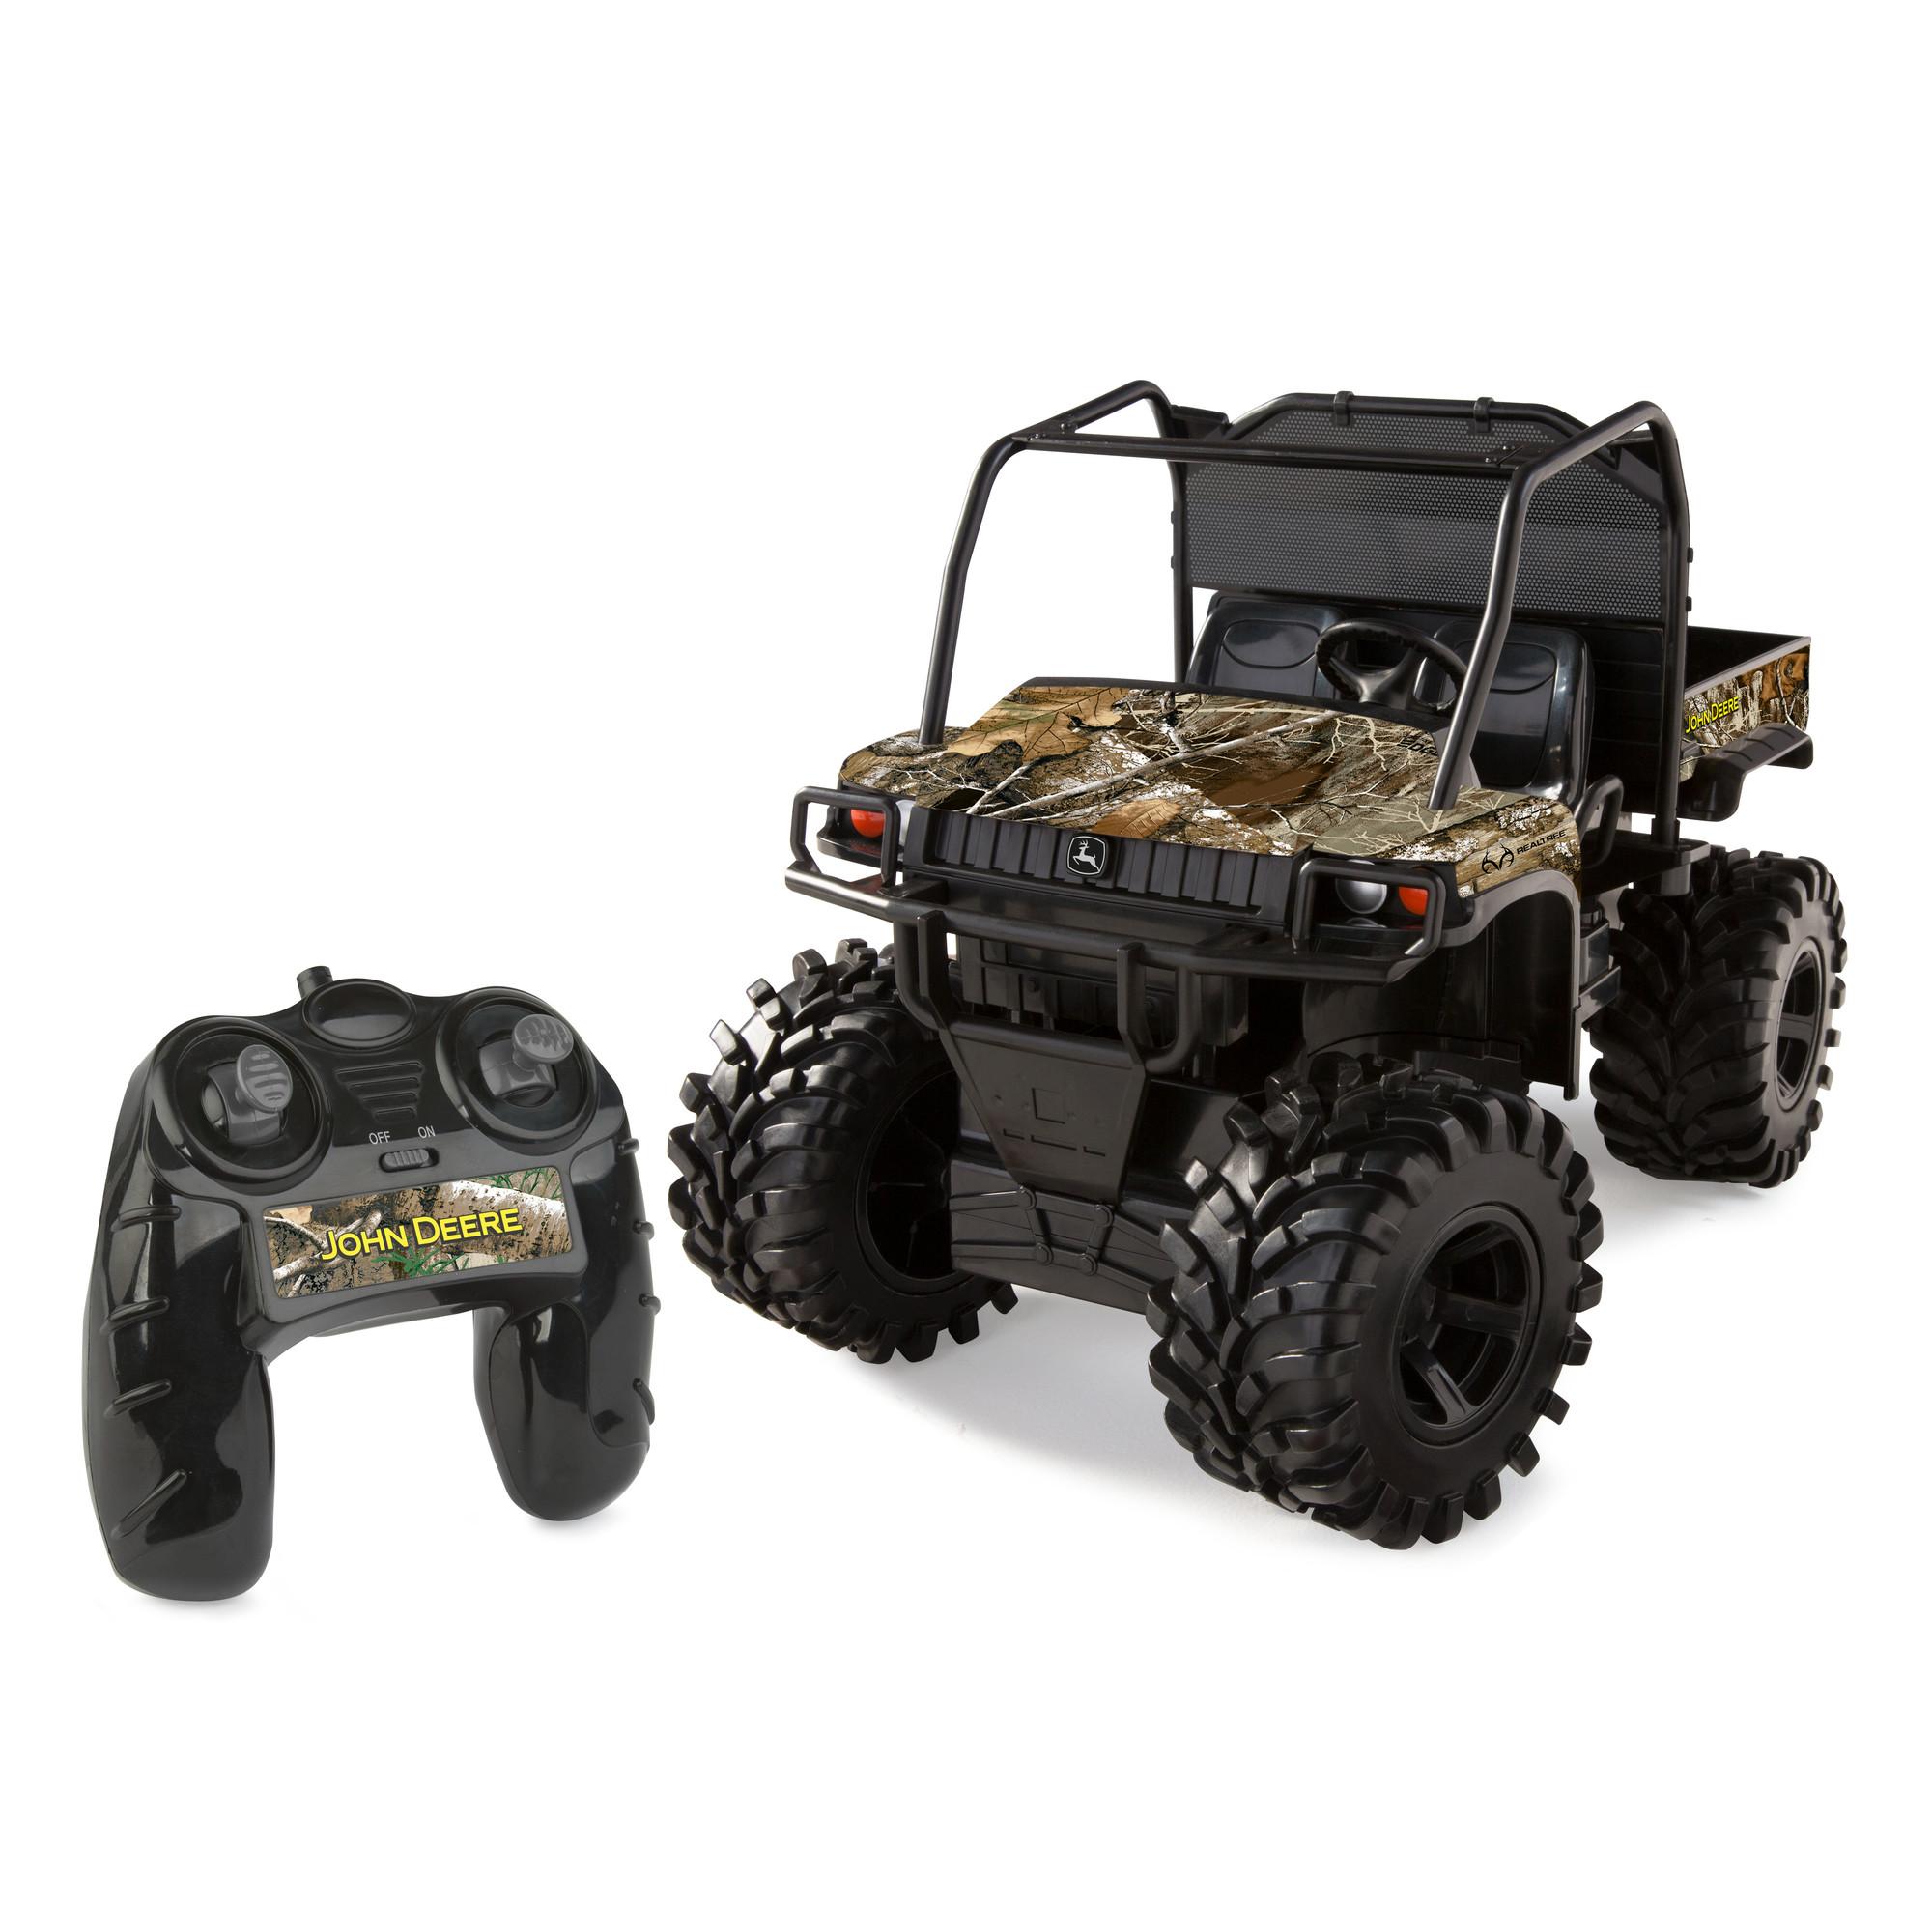 John Deere Monster Treads Realtree R C Gator by Tomy Inc